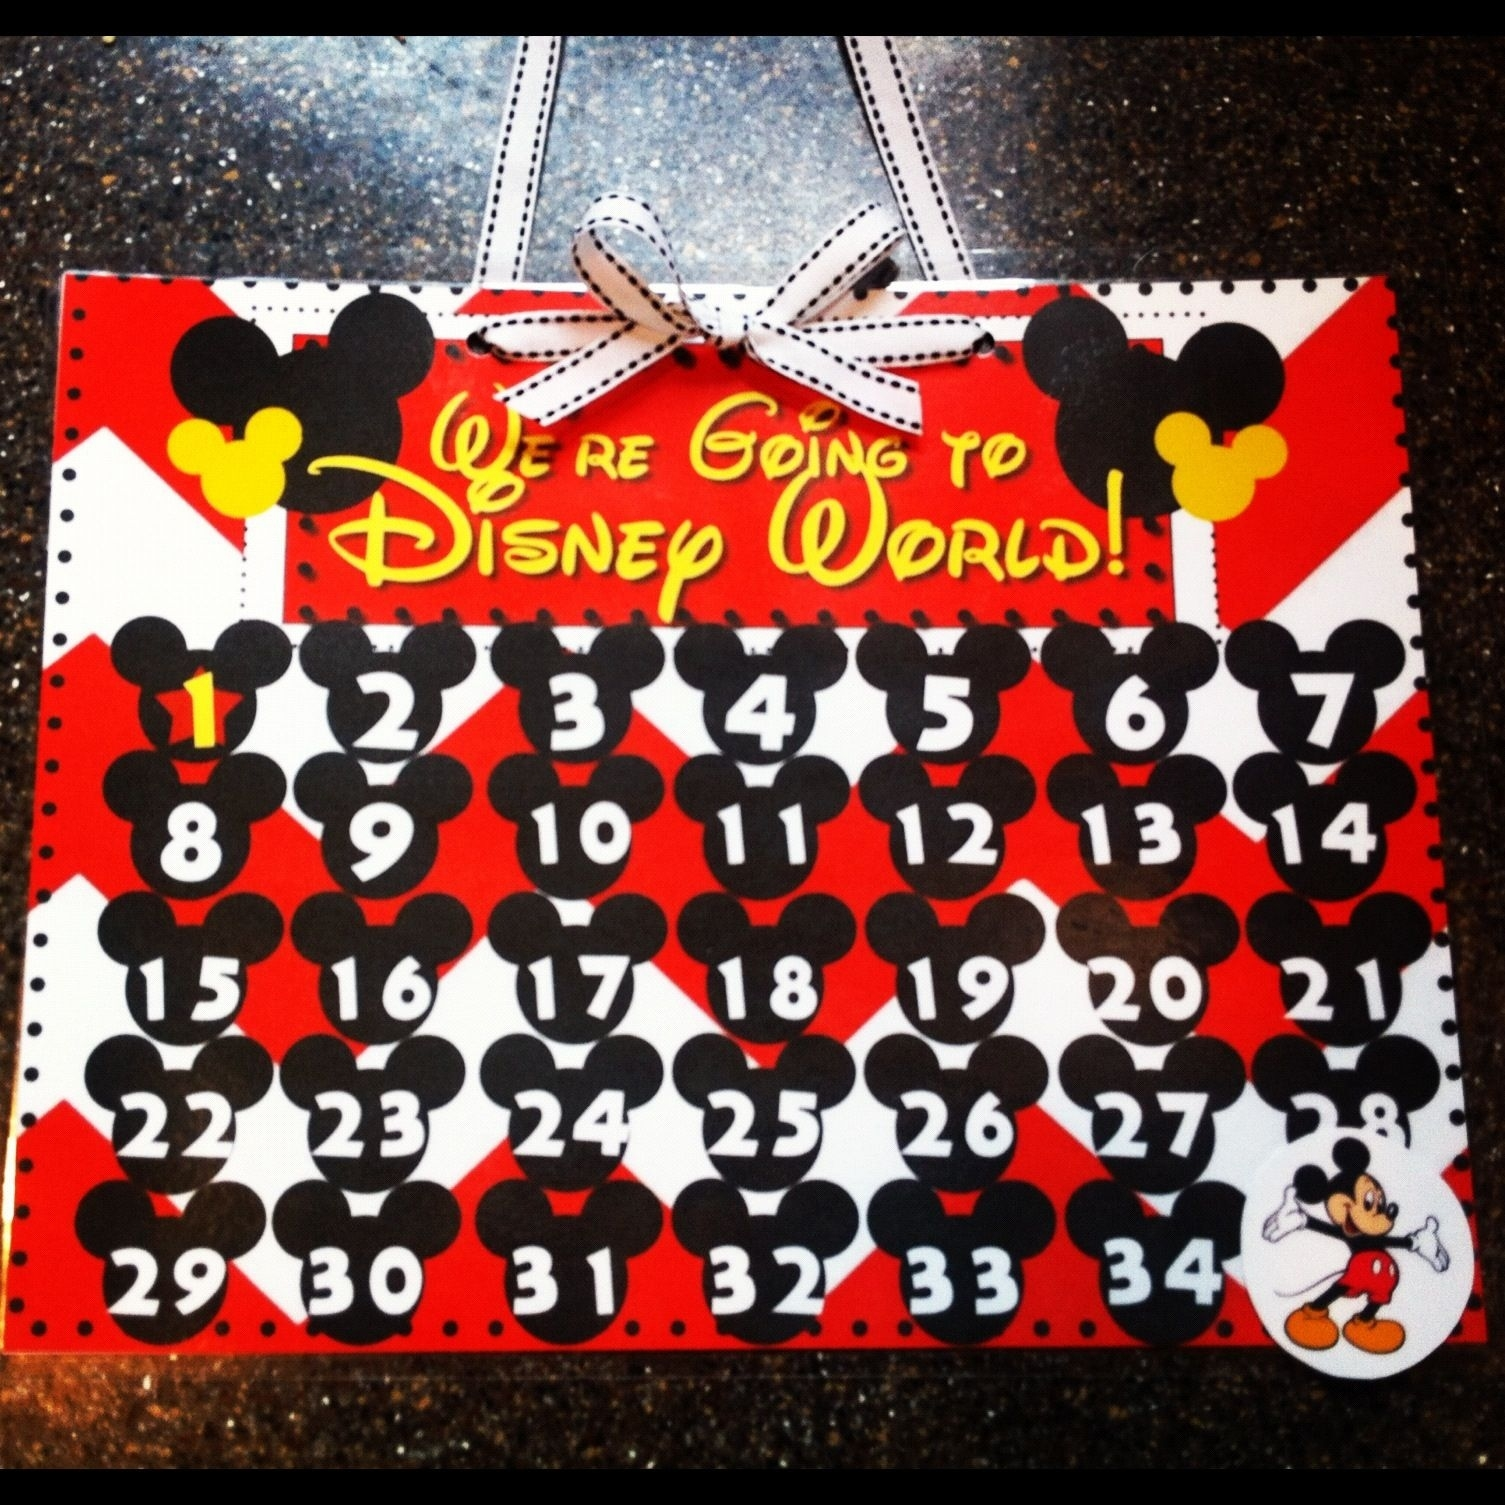 Disney Countdown Calendar- Free Printable | Disney Countdown Remarkable Printable Disney Countdown To 60 Calendar